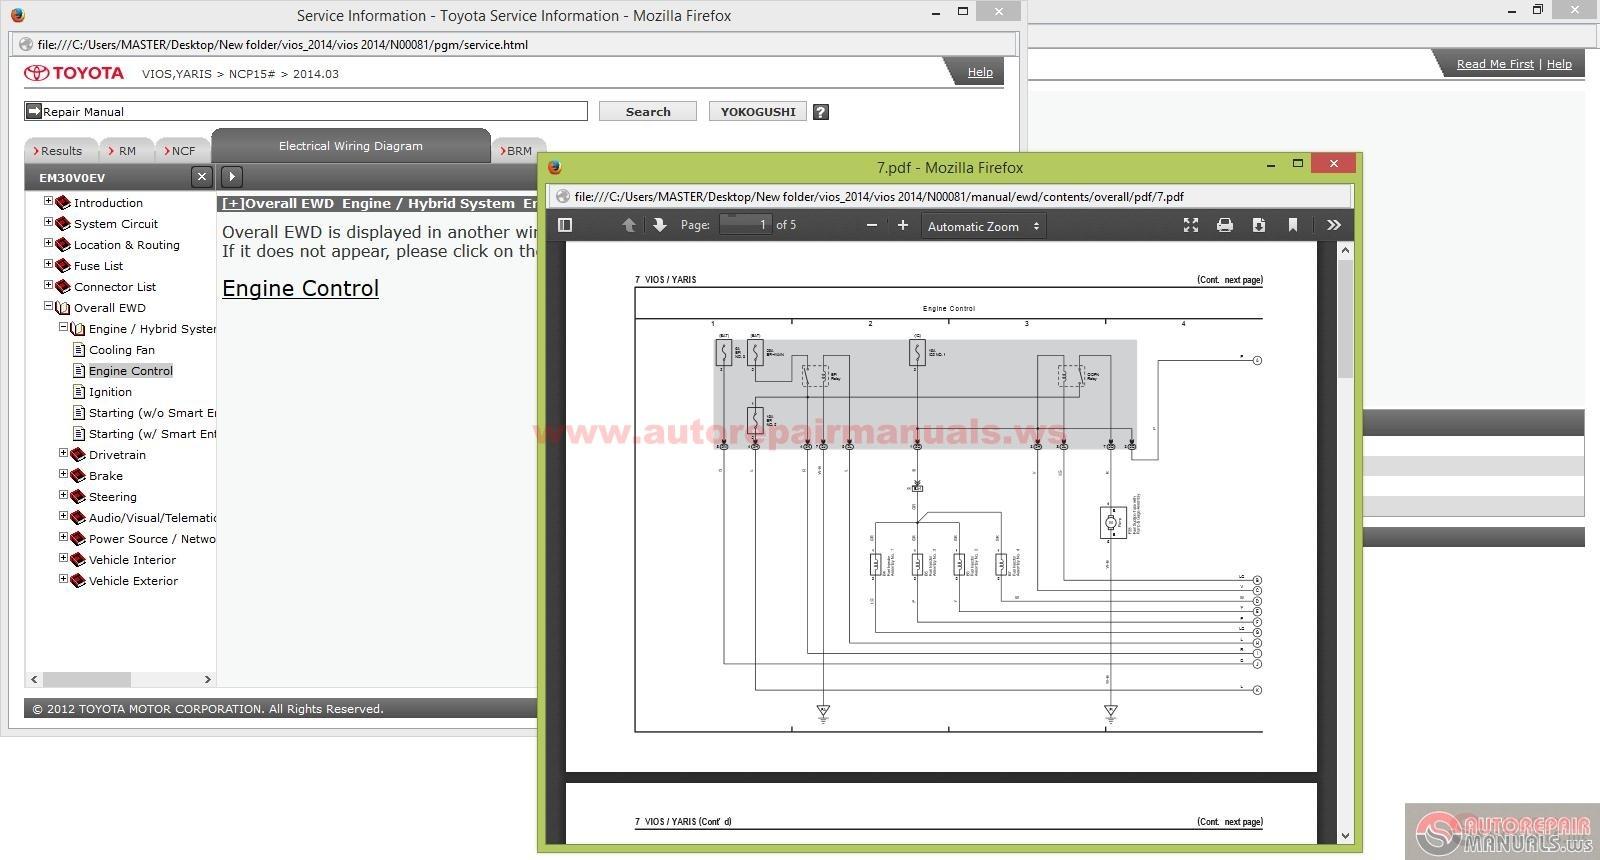 toyota yaris gsic workshop new updated manual dvd full download [ 1600 x 860 Pixel ]